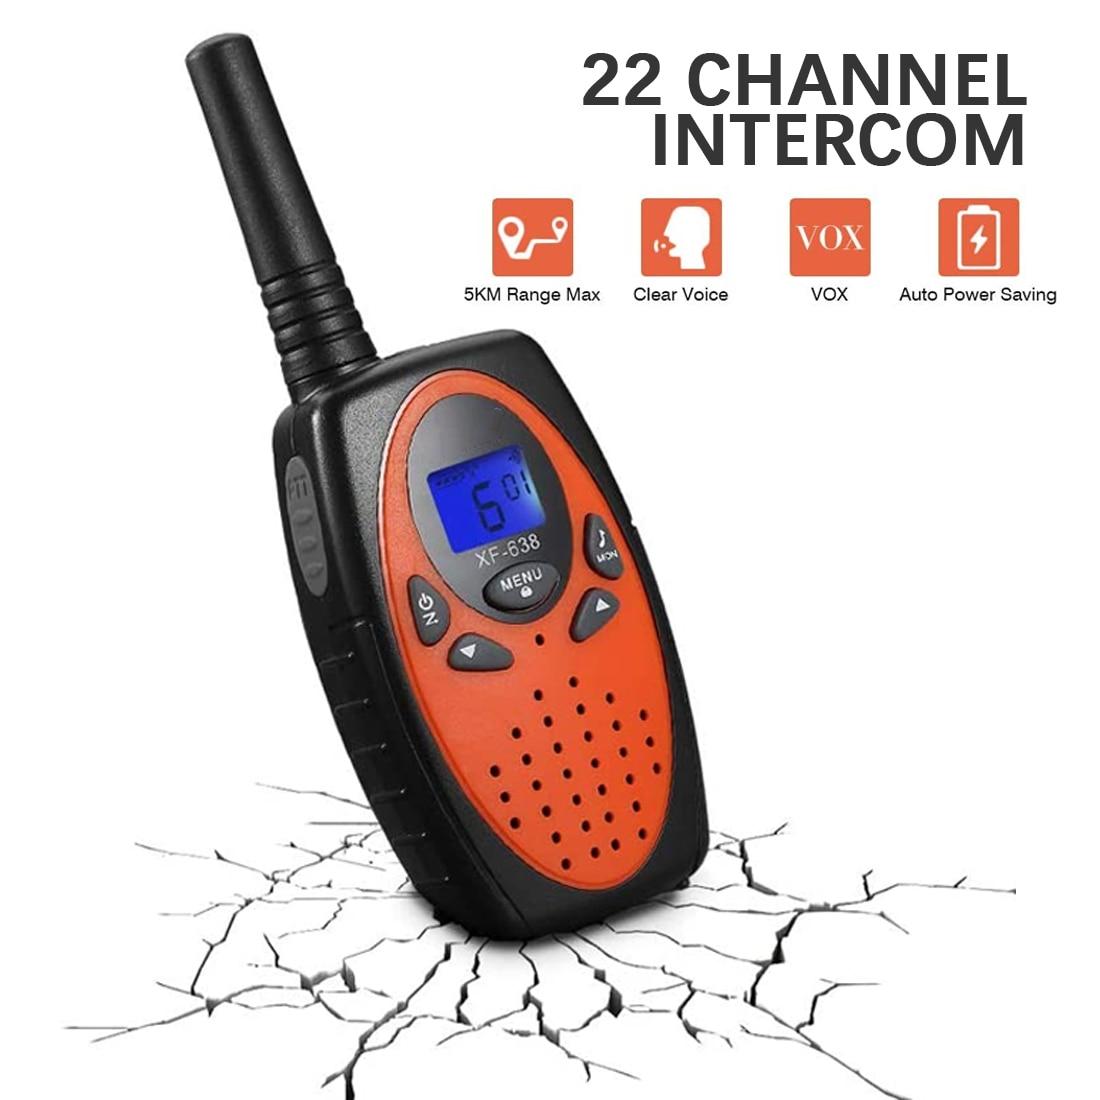 Marnaska MIni Walkie Talkies 2Pcs/Pack 22 Channels  Children Gift/Family Use/Camping Two Way Radio Handheld Interphone